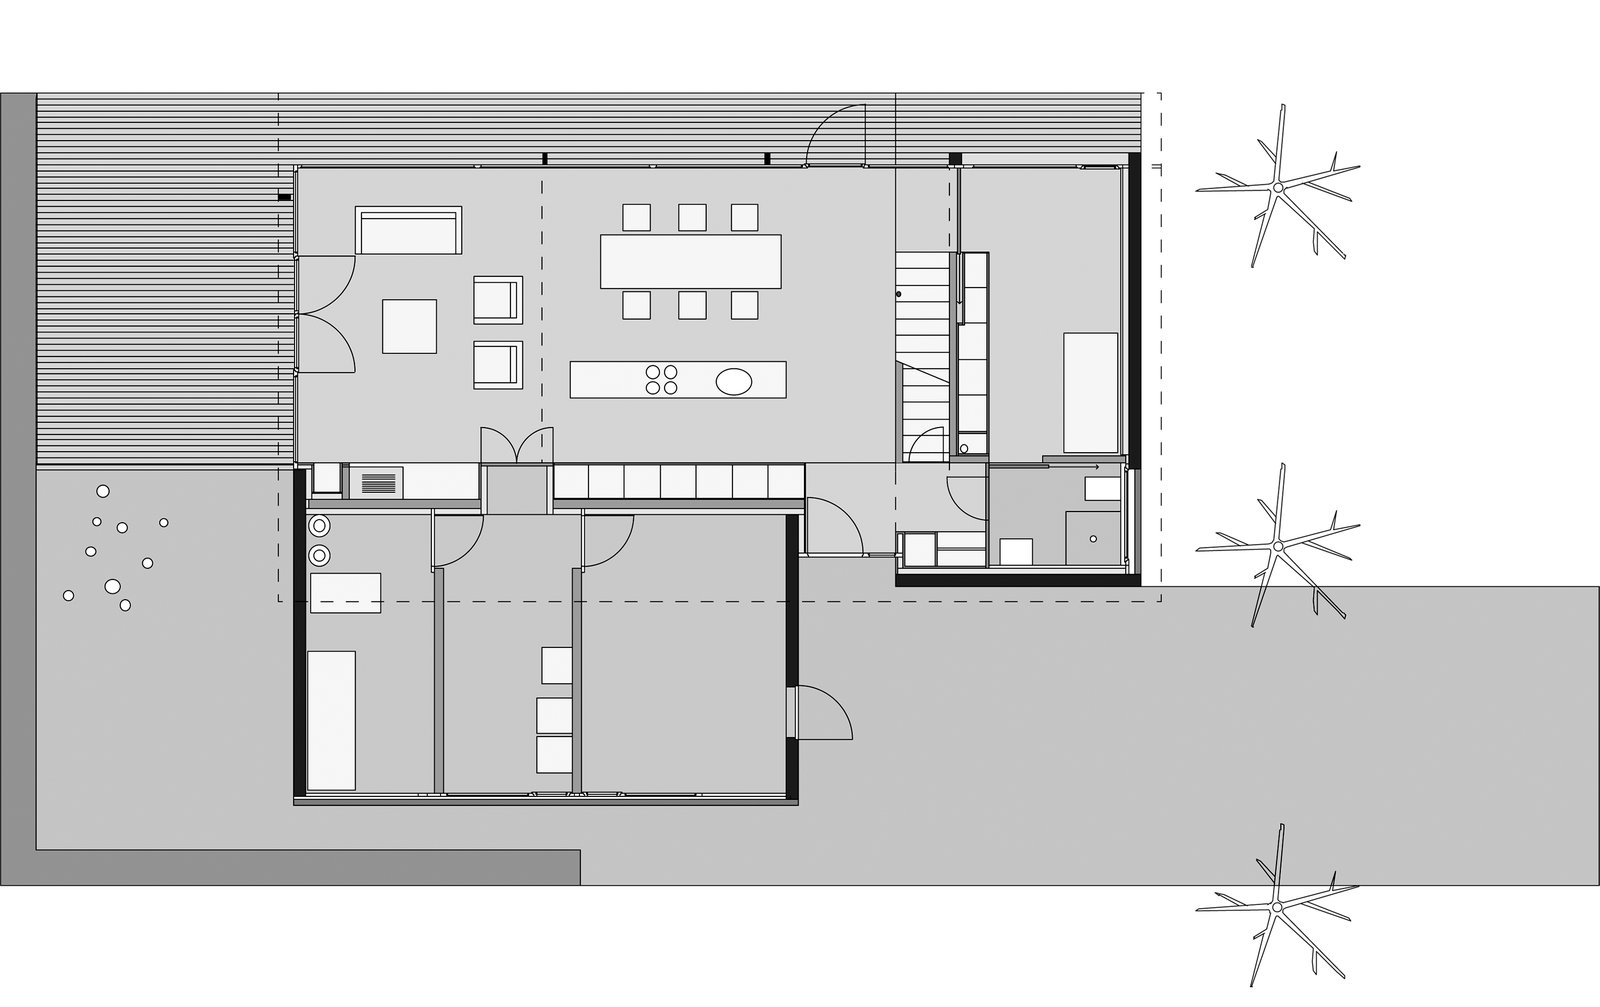 Grundriss Schlafzimmer Erdgeschoss. Bettwäsche Richtig ...